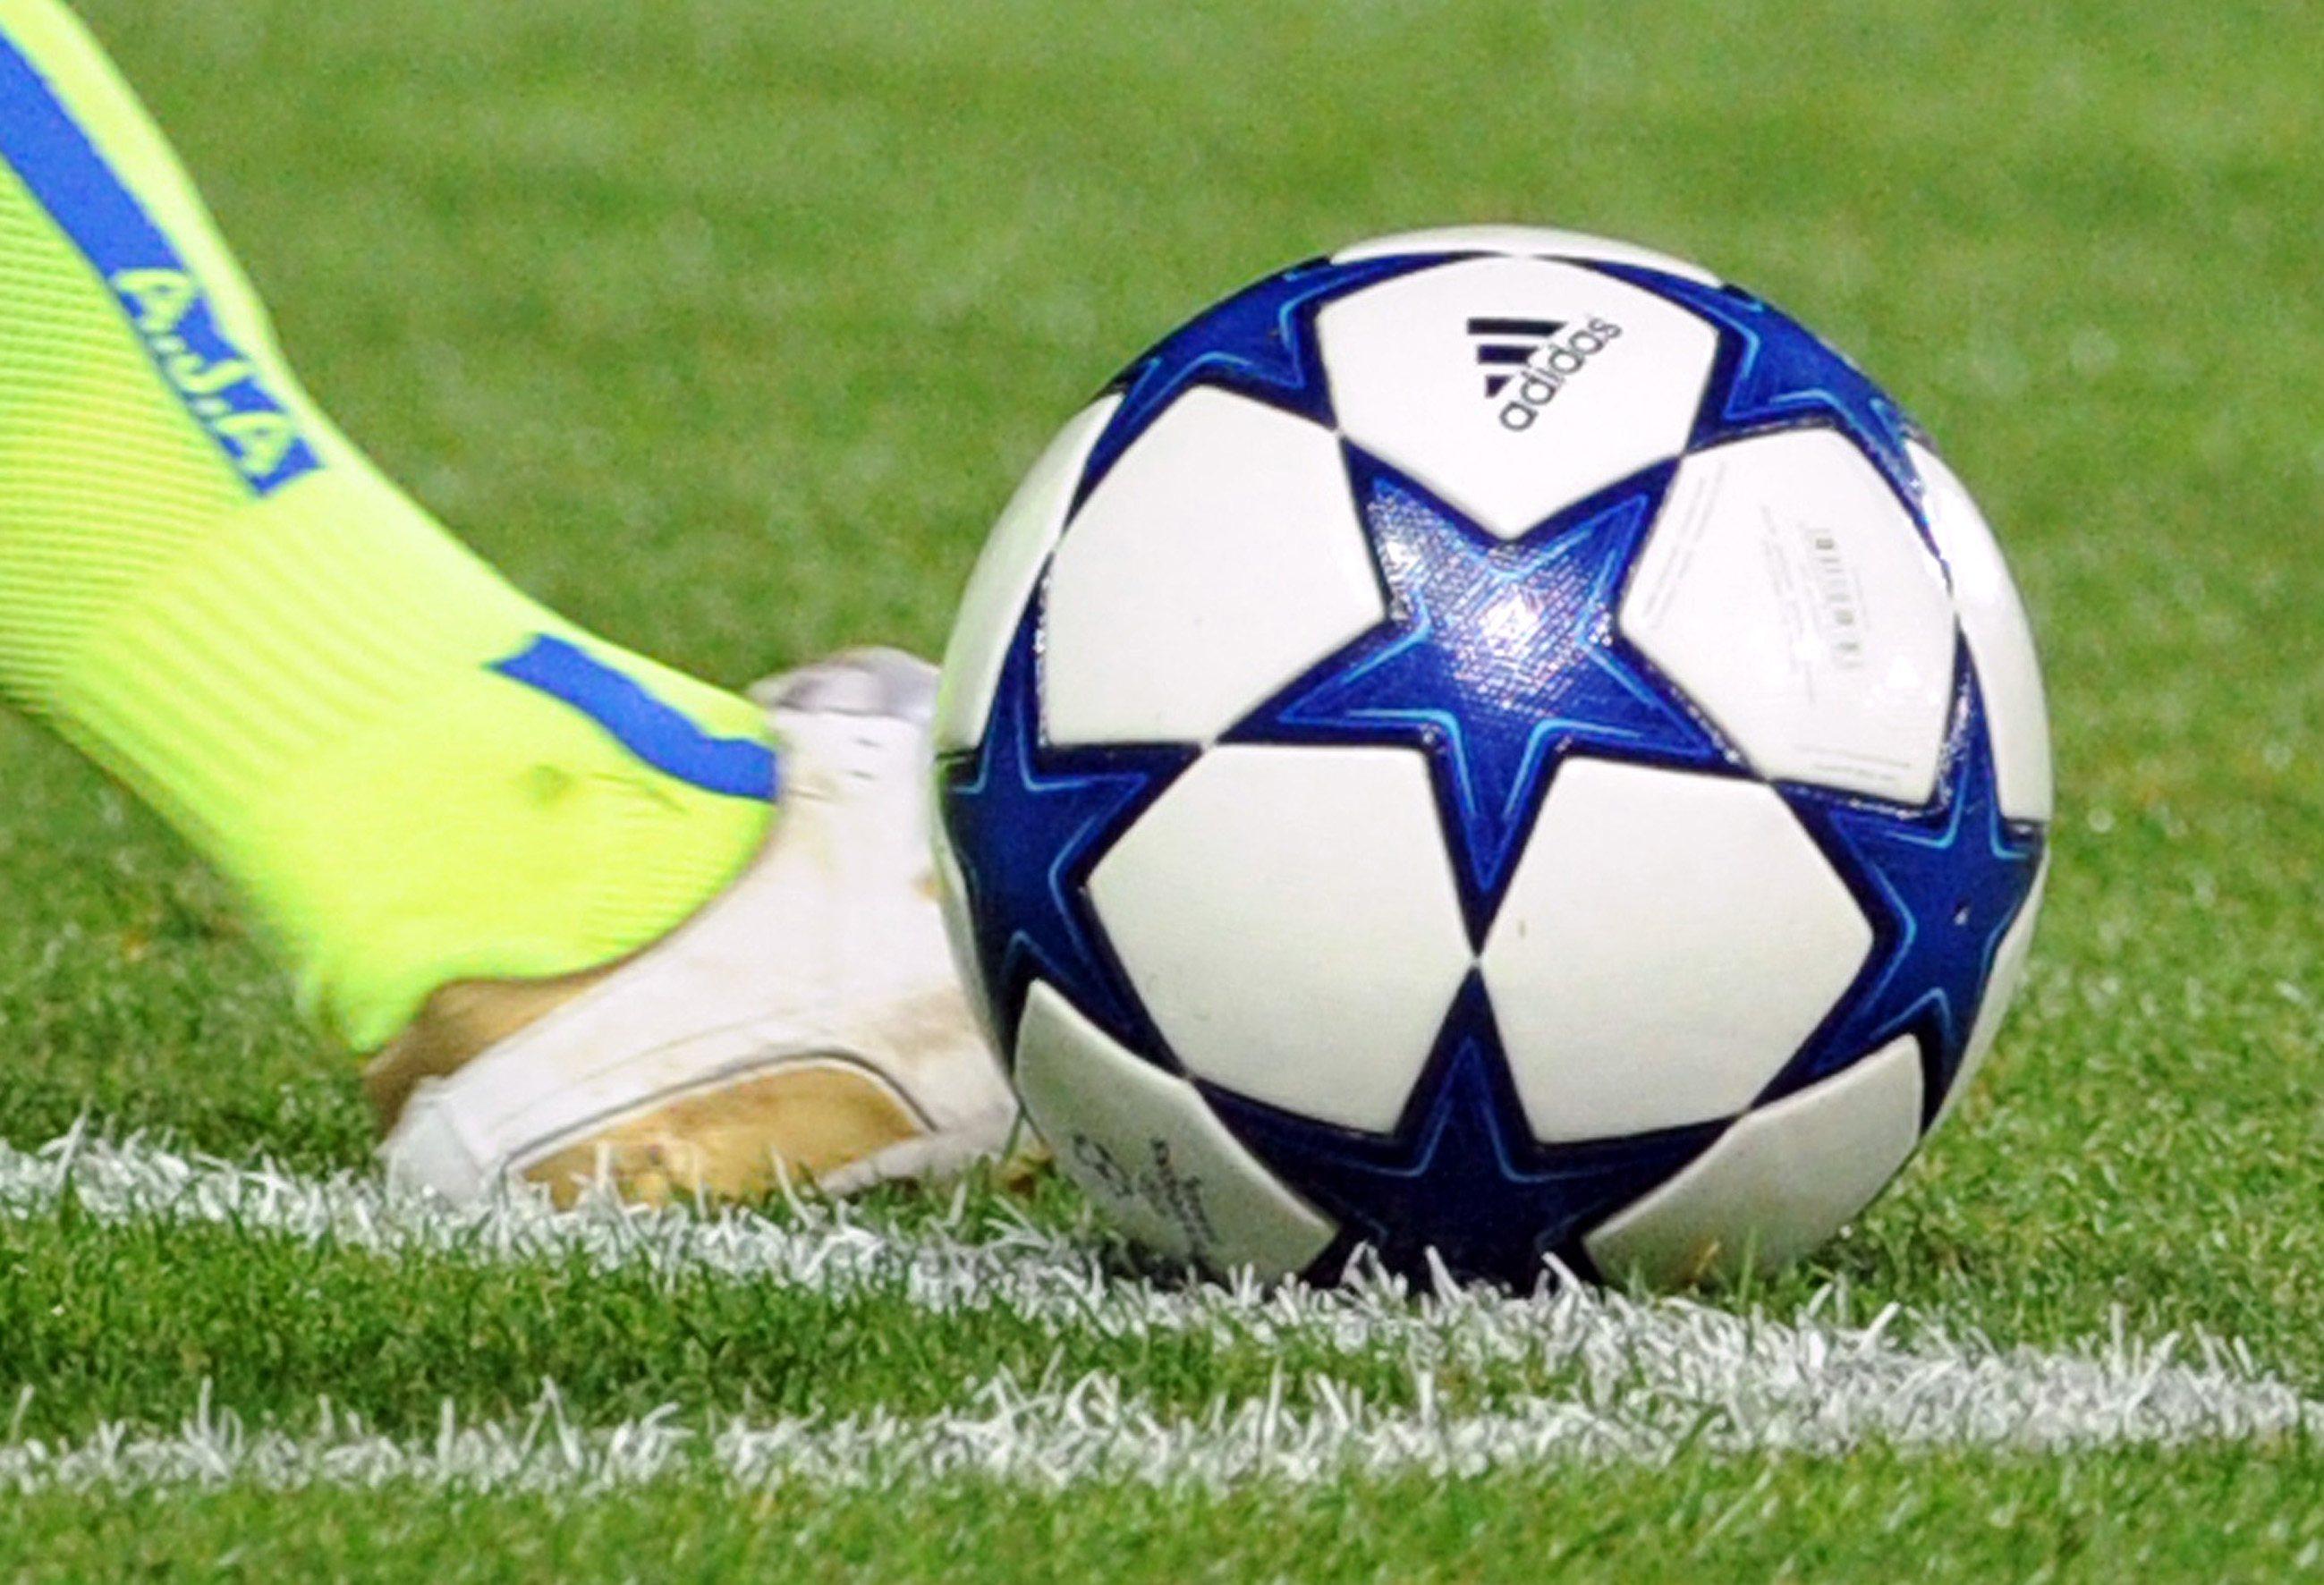 Football : Auxerre / Real de Madrid - Champions League - 28.09.2010 - Illustration